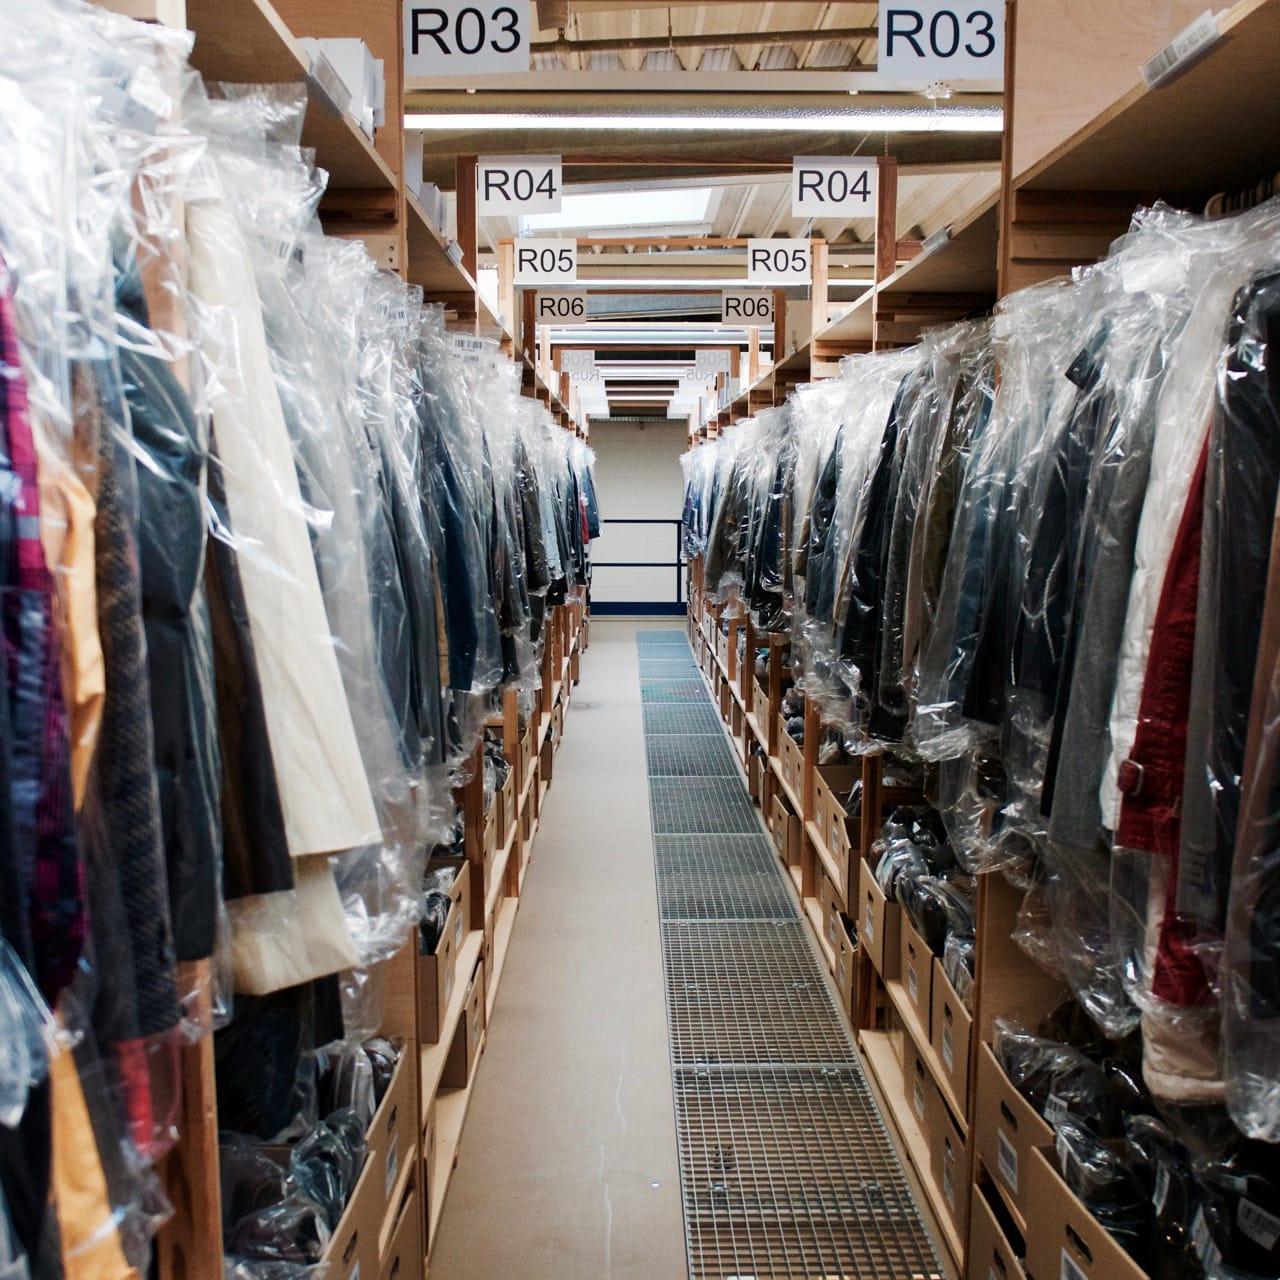 DASISTmomox fashion - Folge mir durch unser Lager 34